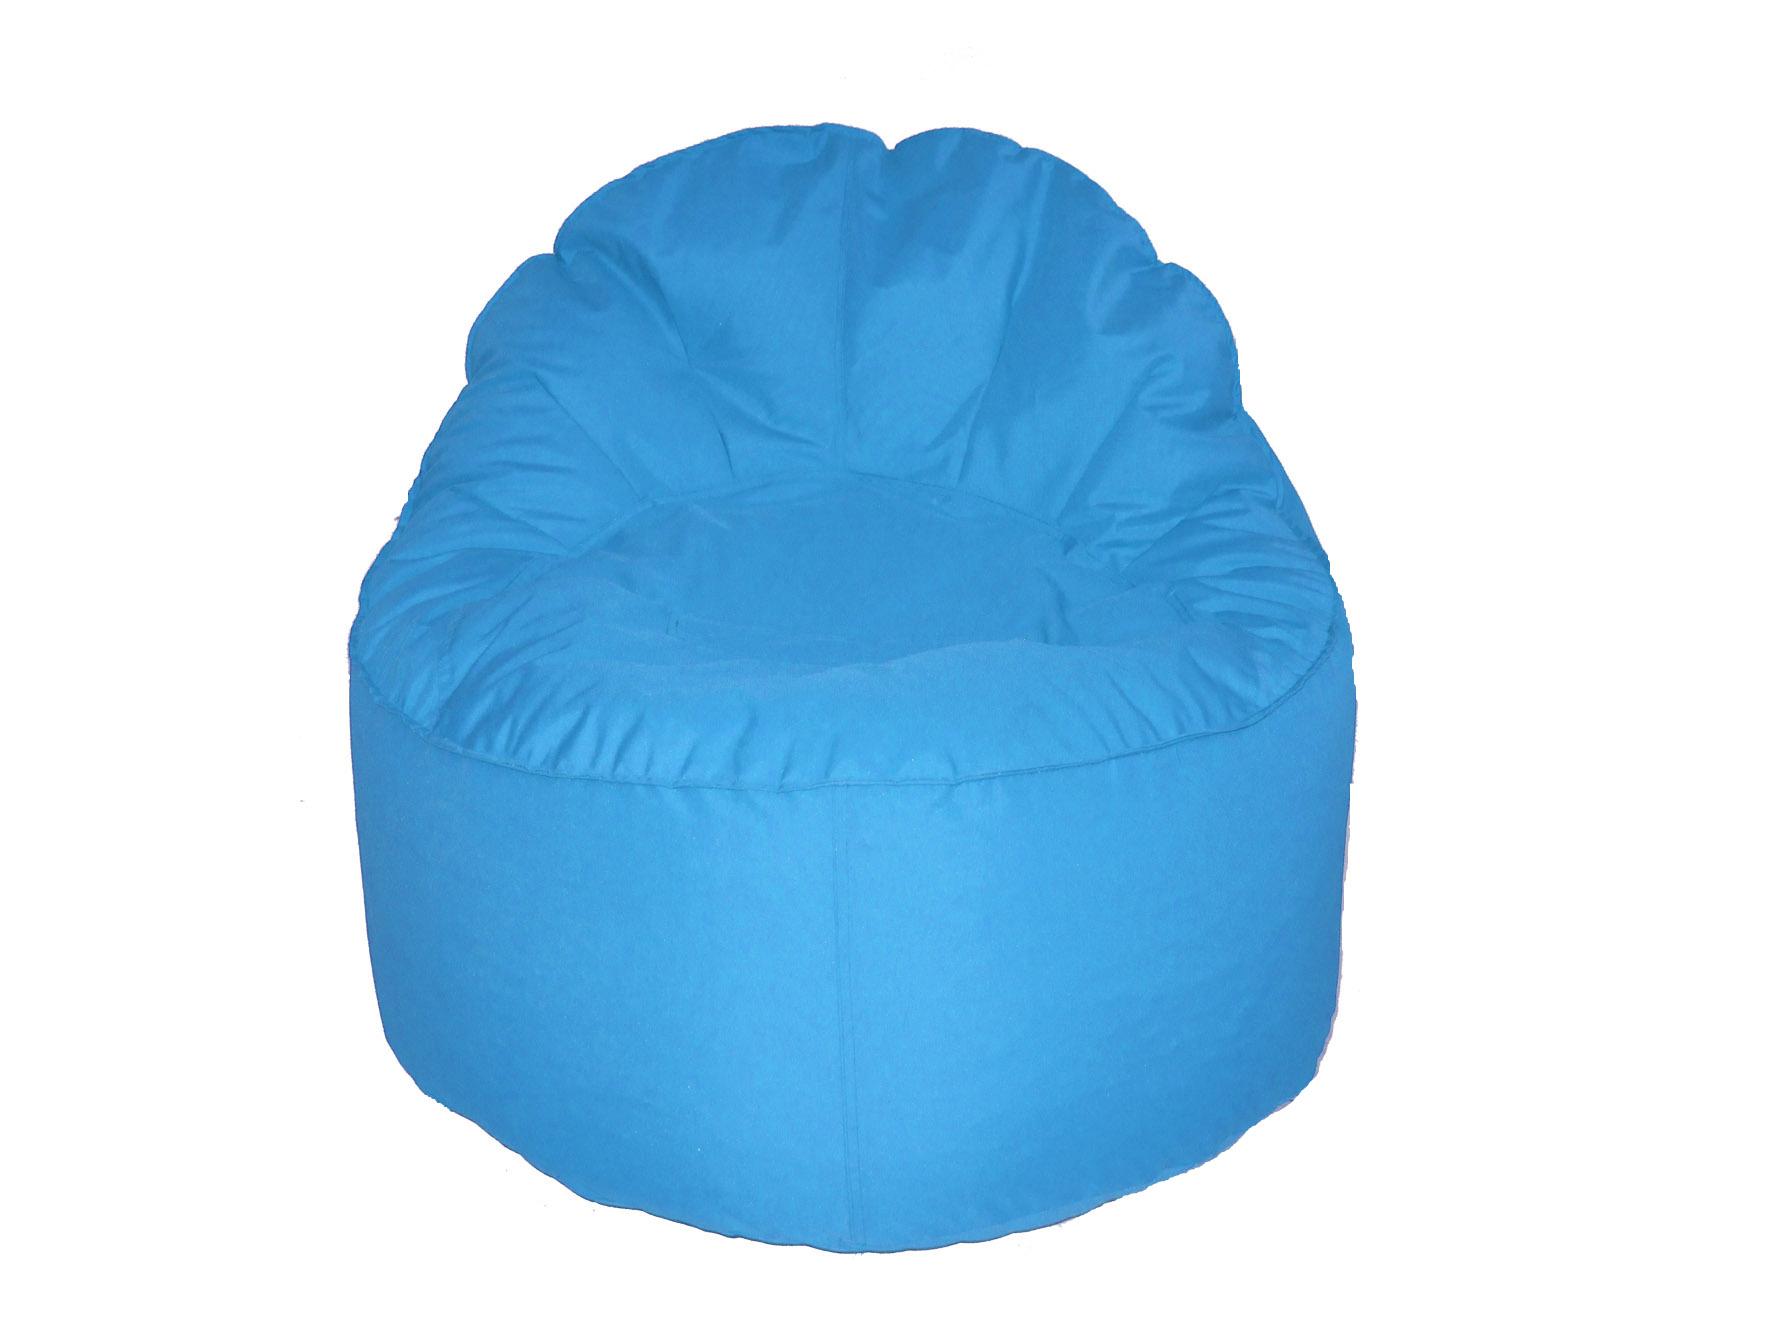 pouf fun bleu aubergine camel noir orange. Black Bedroom Furniture Sets. Home Design Ideas